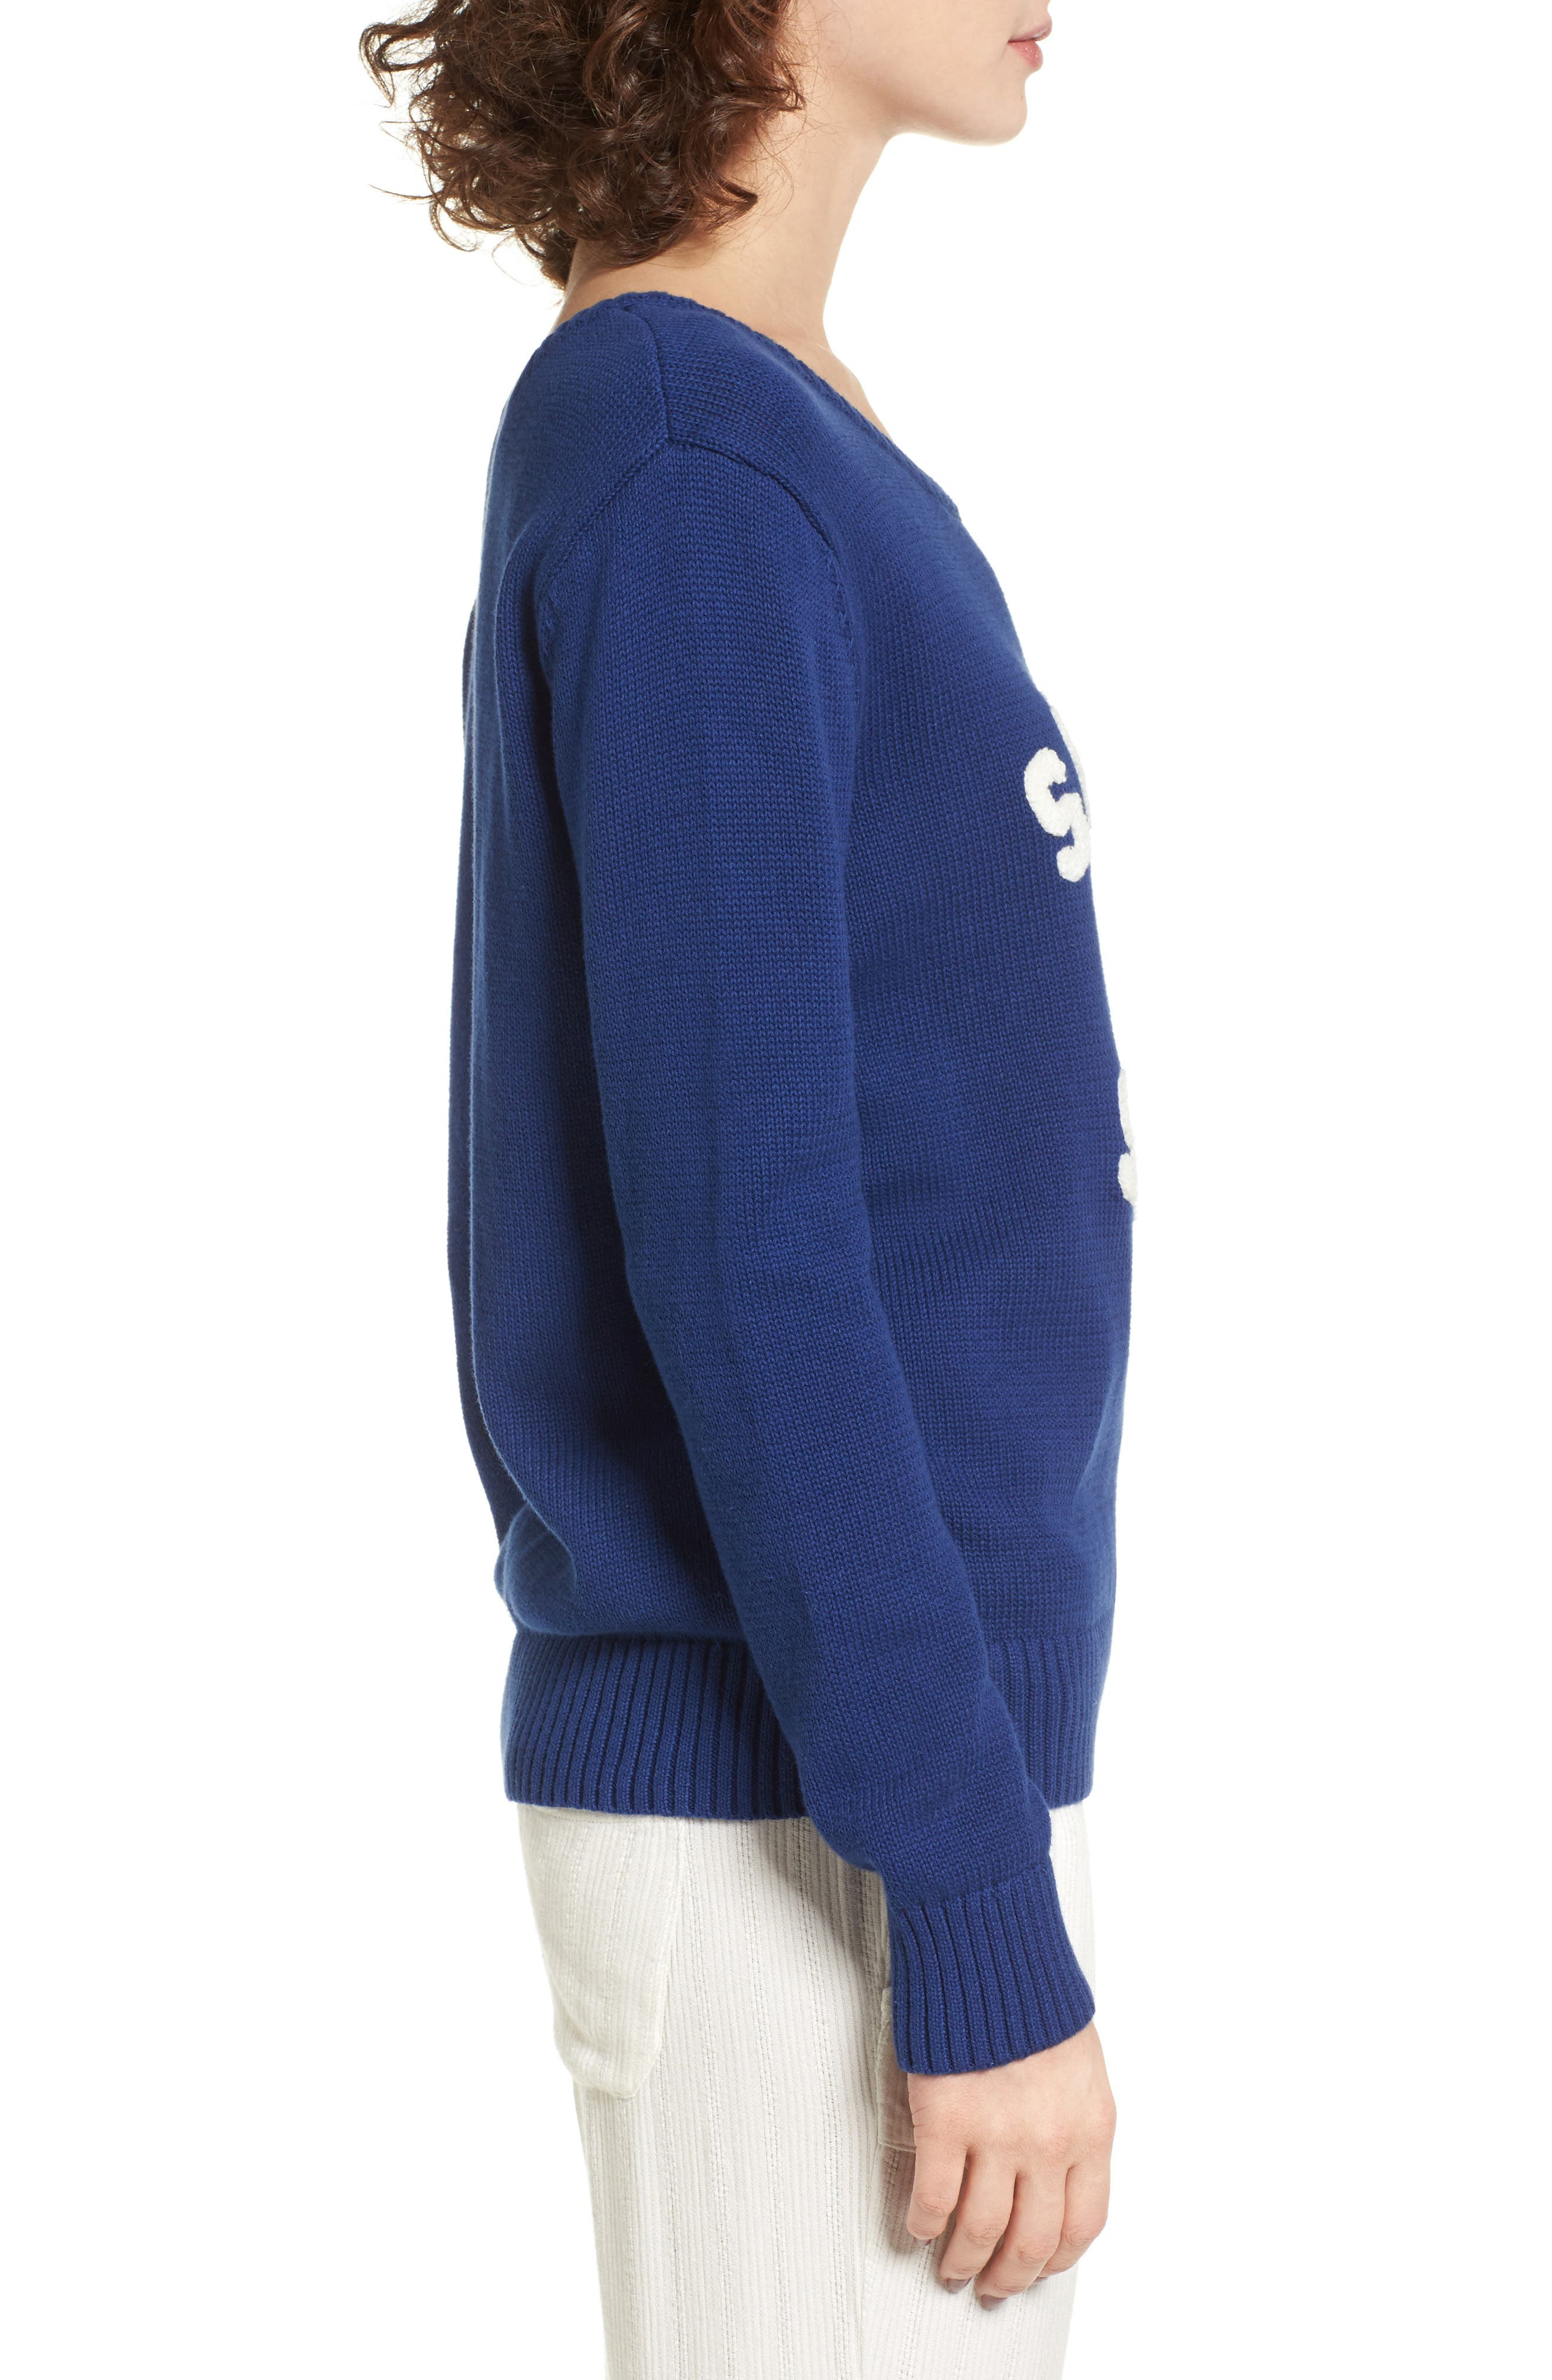 Alternate Image 3  - Roxy Higher Ground Graphic Sweater